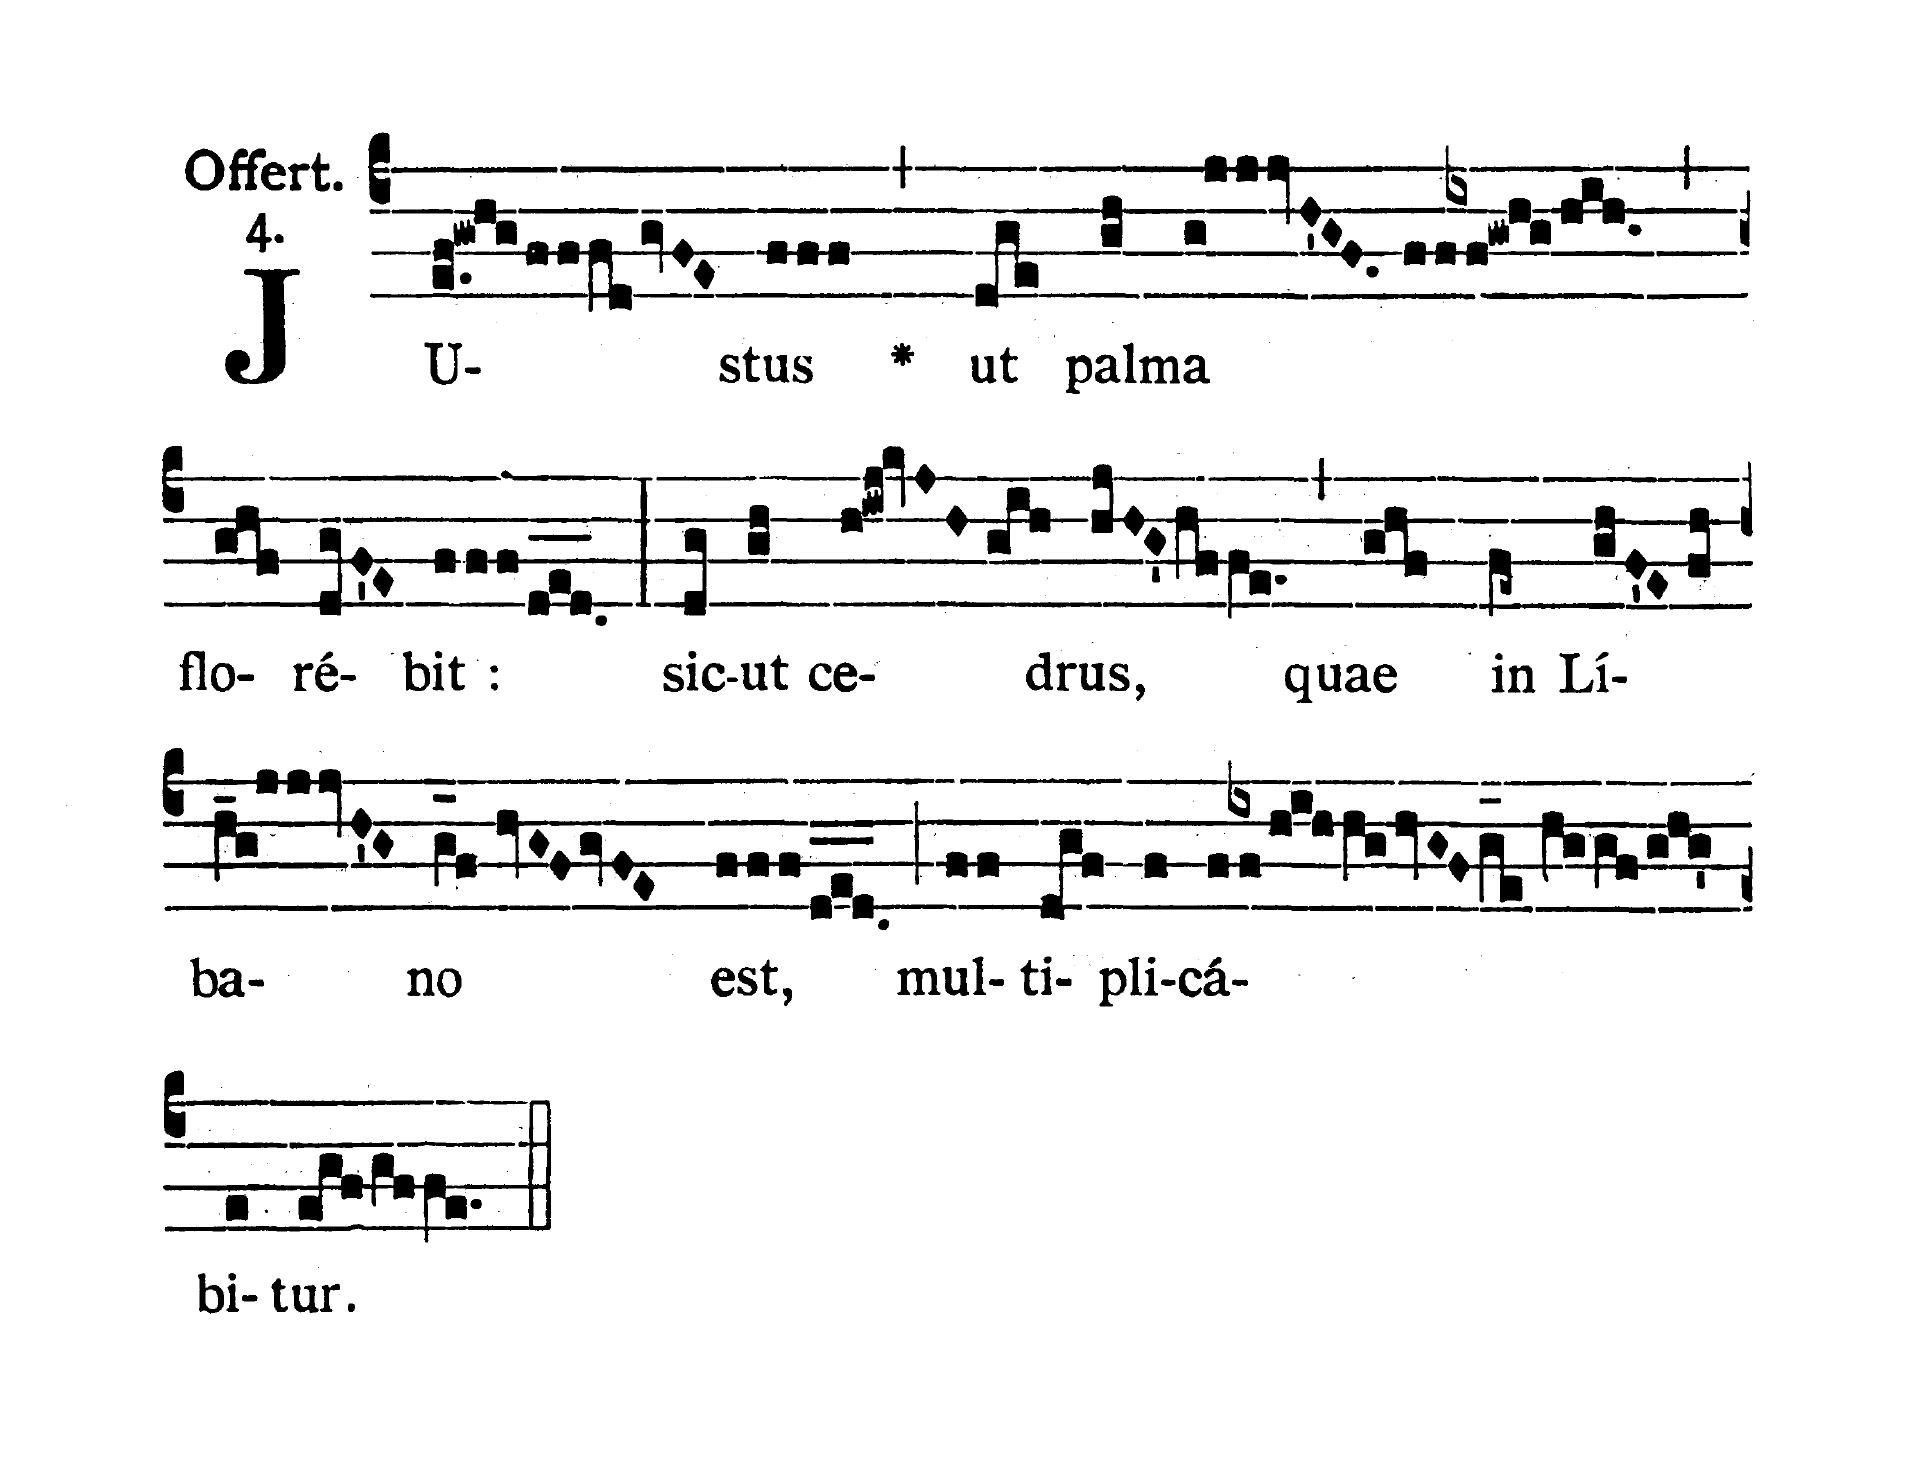 Sancti Joannis Apostoli et Evangelistae (St. John the Evangelist, Apostle) - Offertorium (Justus ut palma)